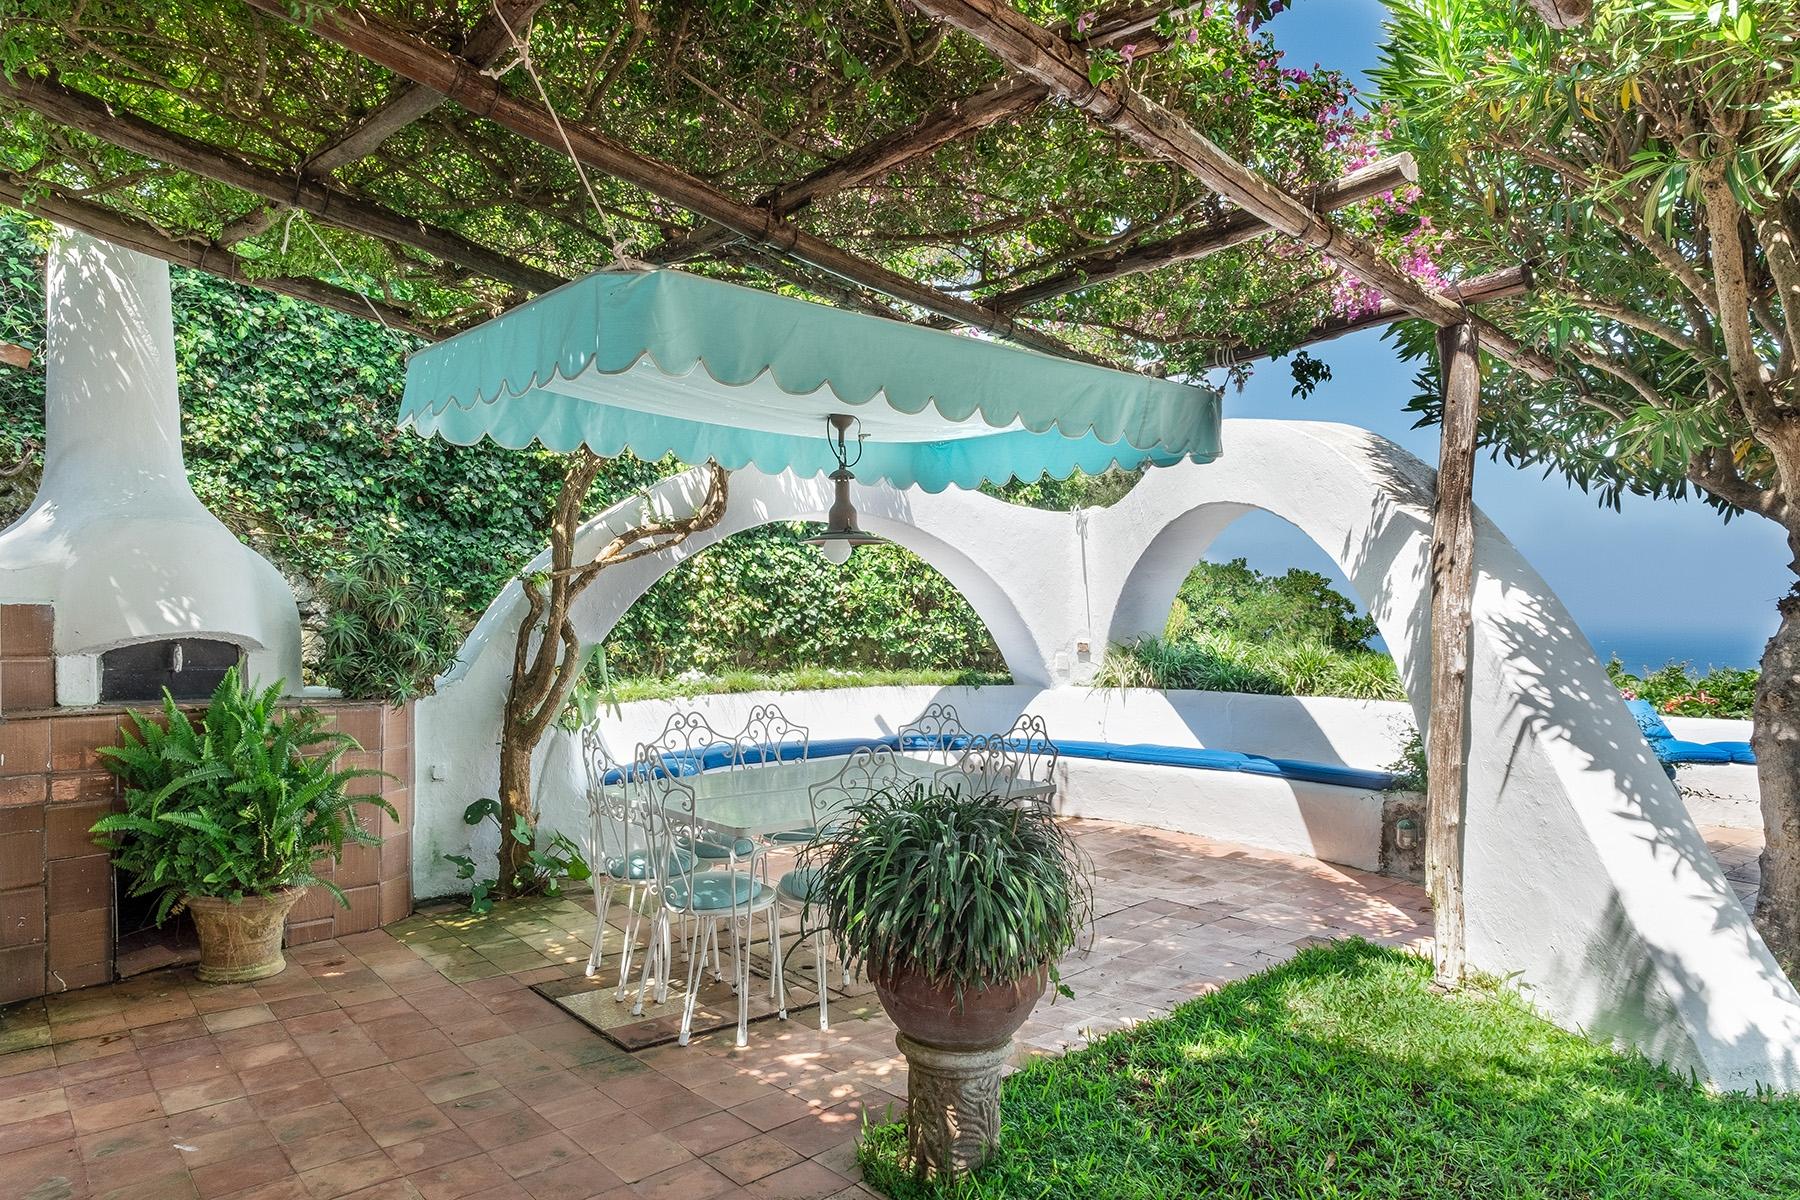 Villa in Vendita a Ischia: 5 locali, 206 mq - Foto 14